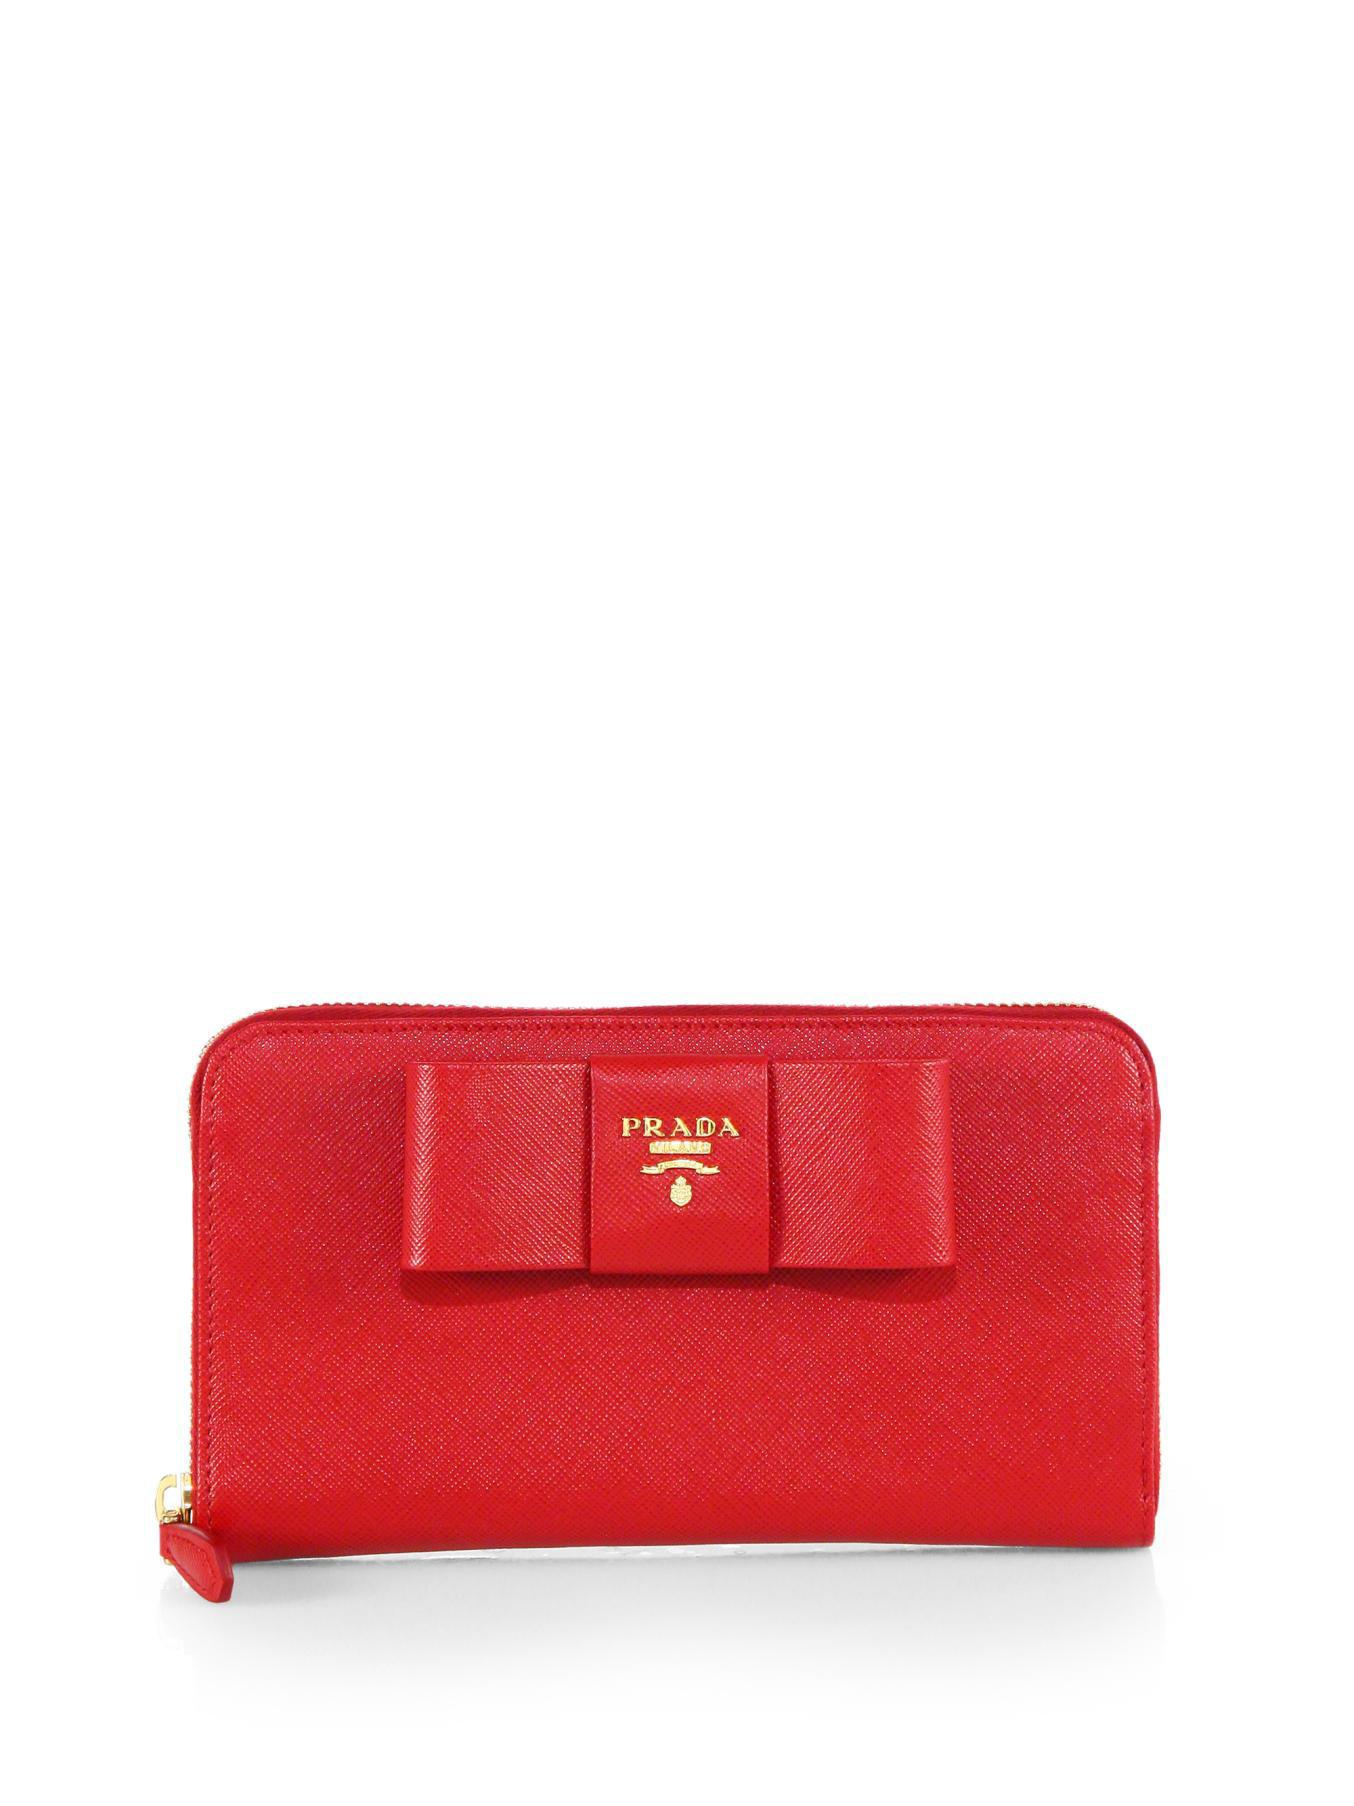 ca633d9aae3d Prada Saffiano Bow Zip-Around Wallet in Red - Lyst